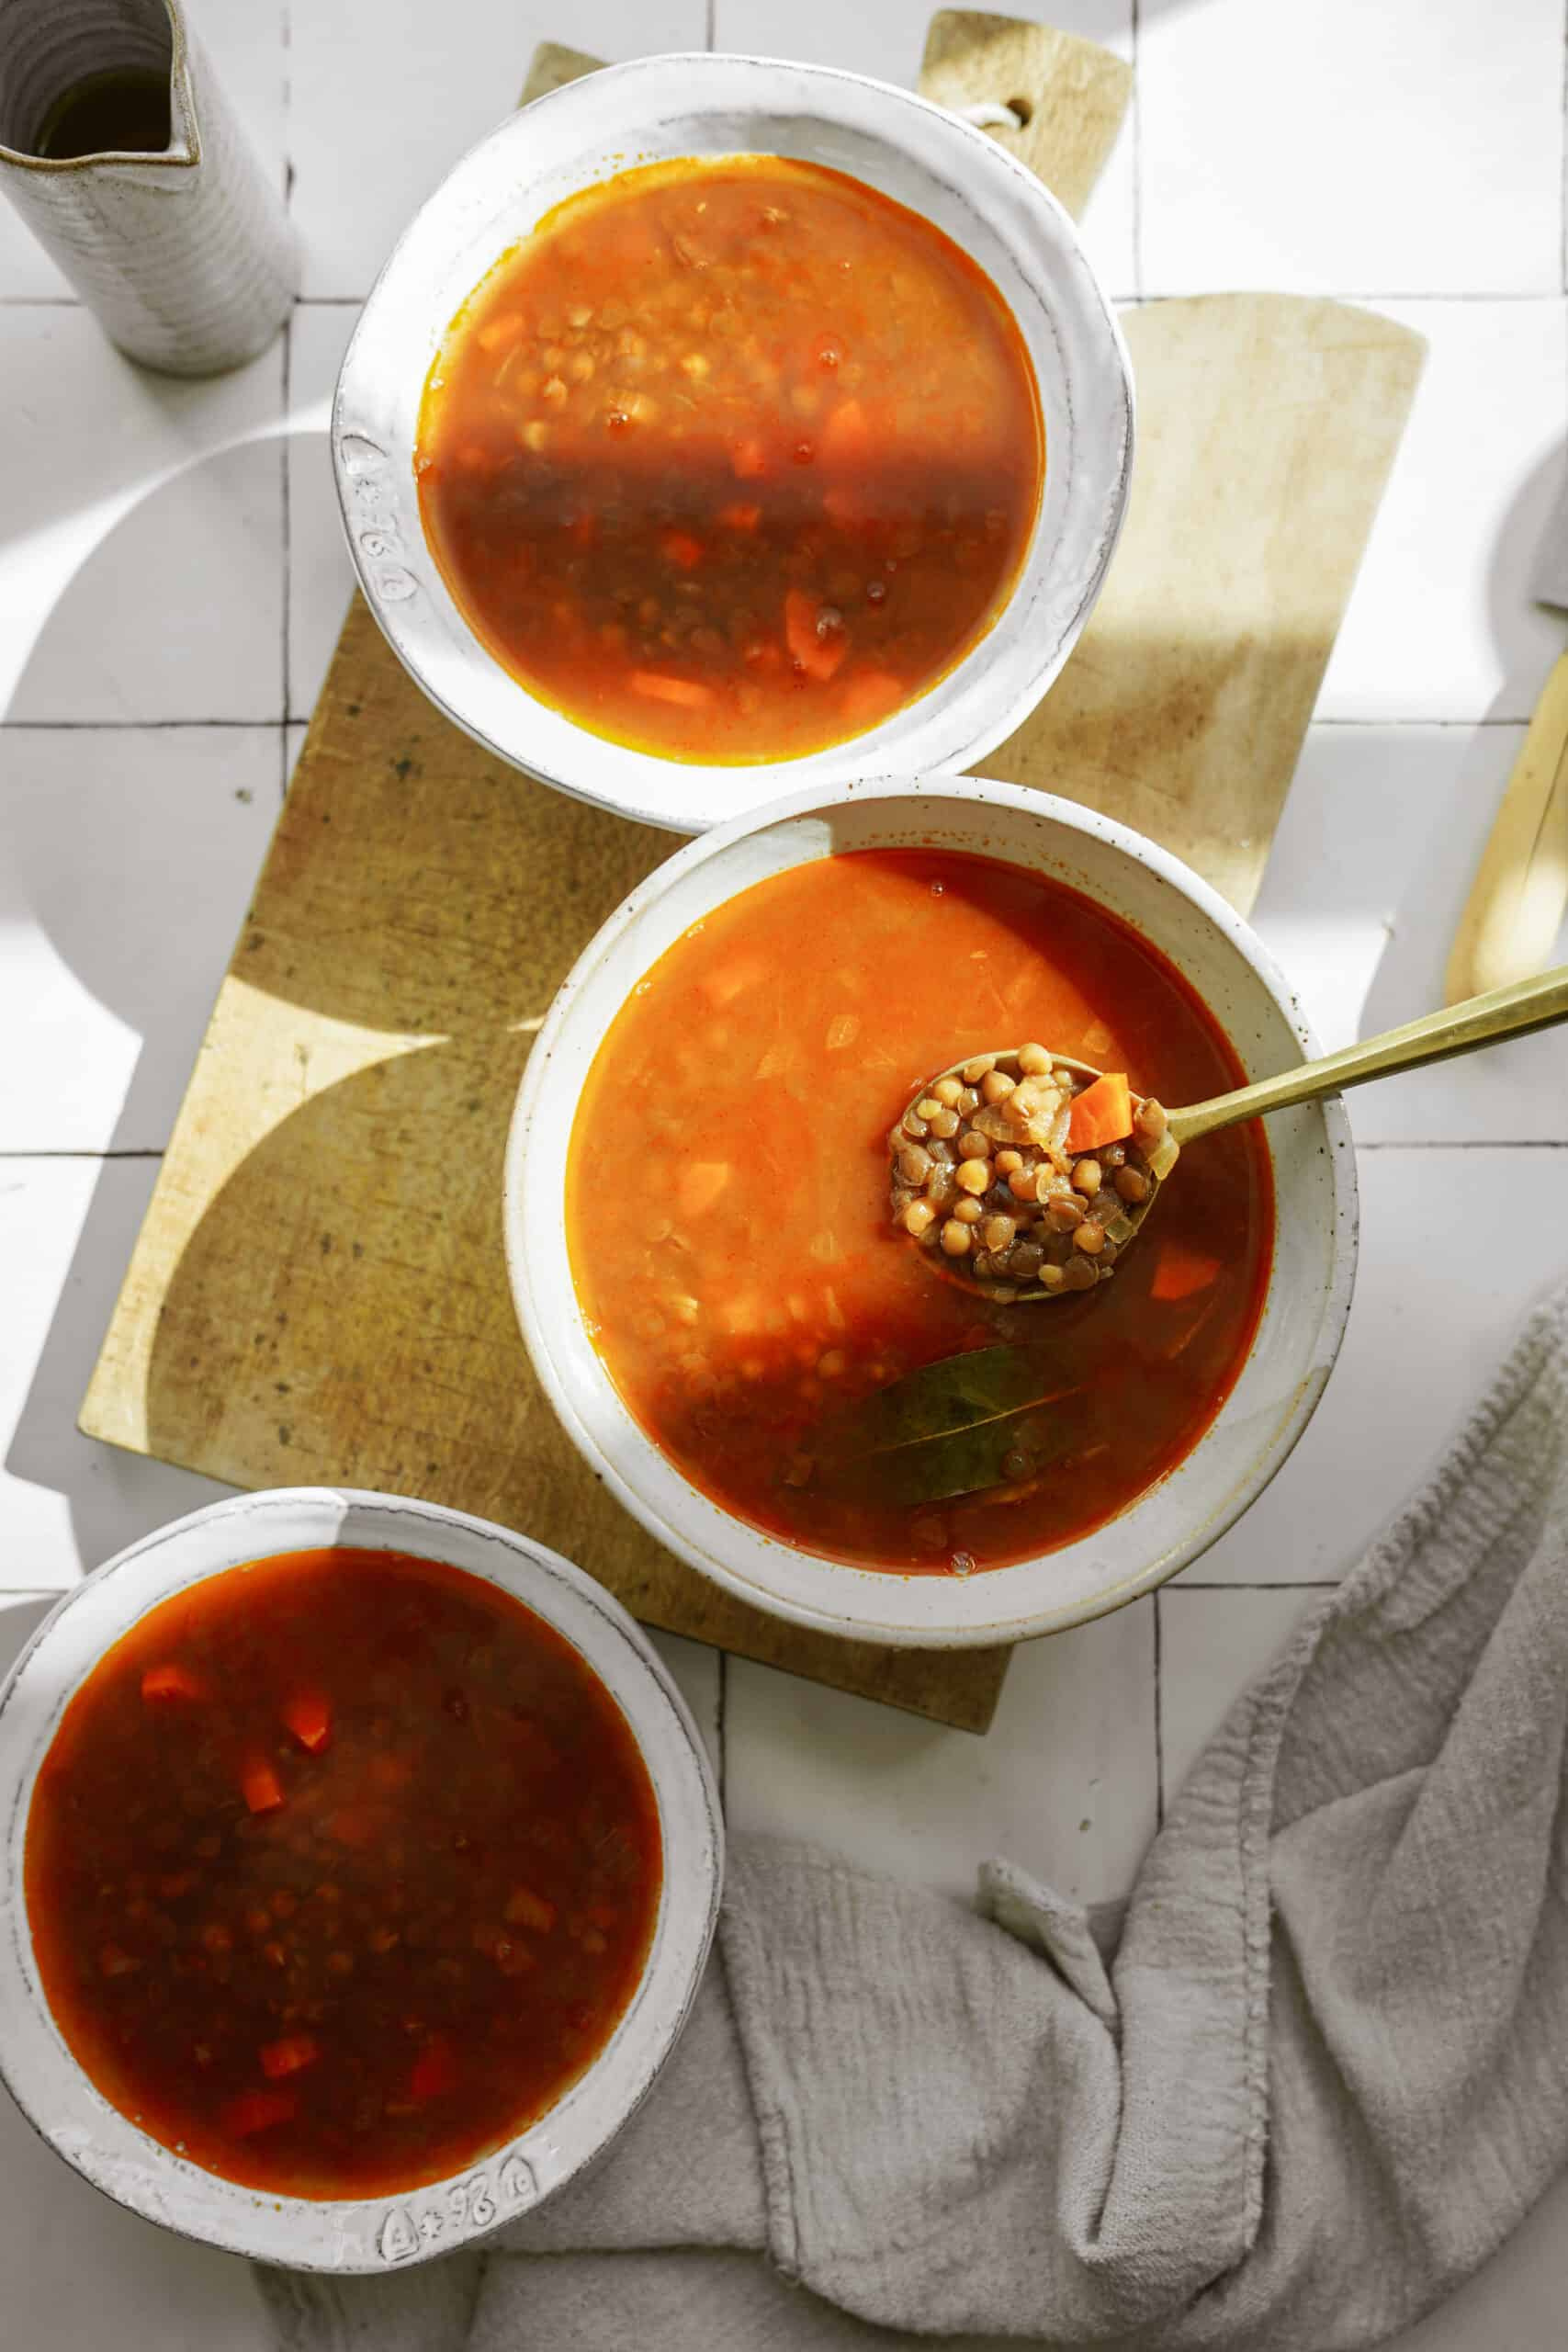 Greek lentil soup (fakes) in white bowls